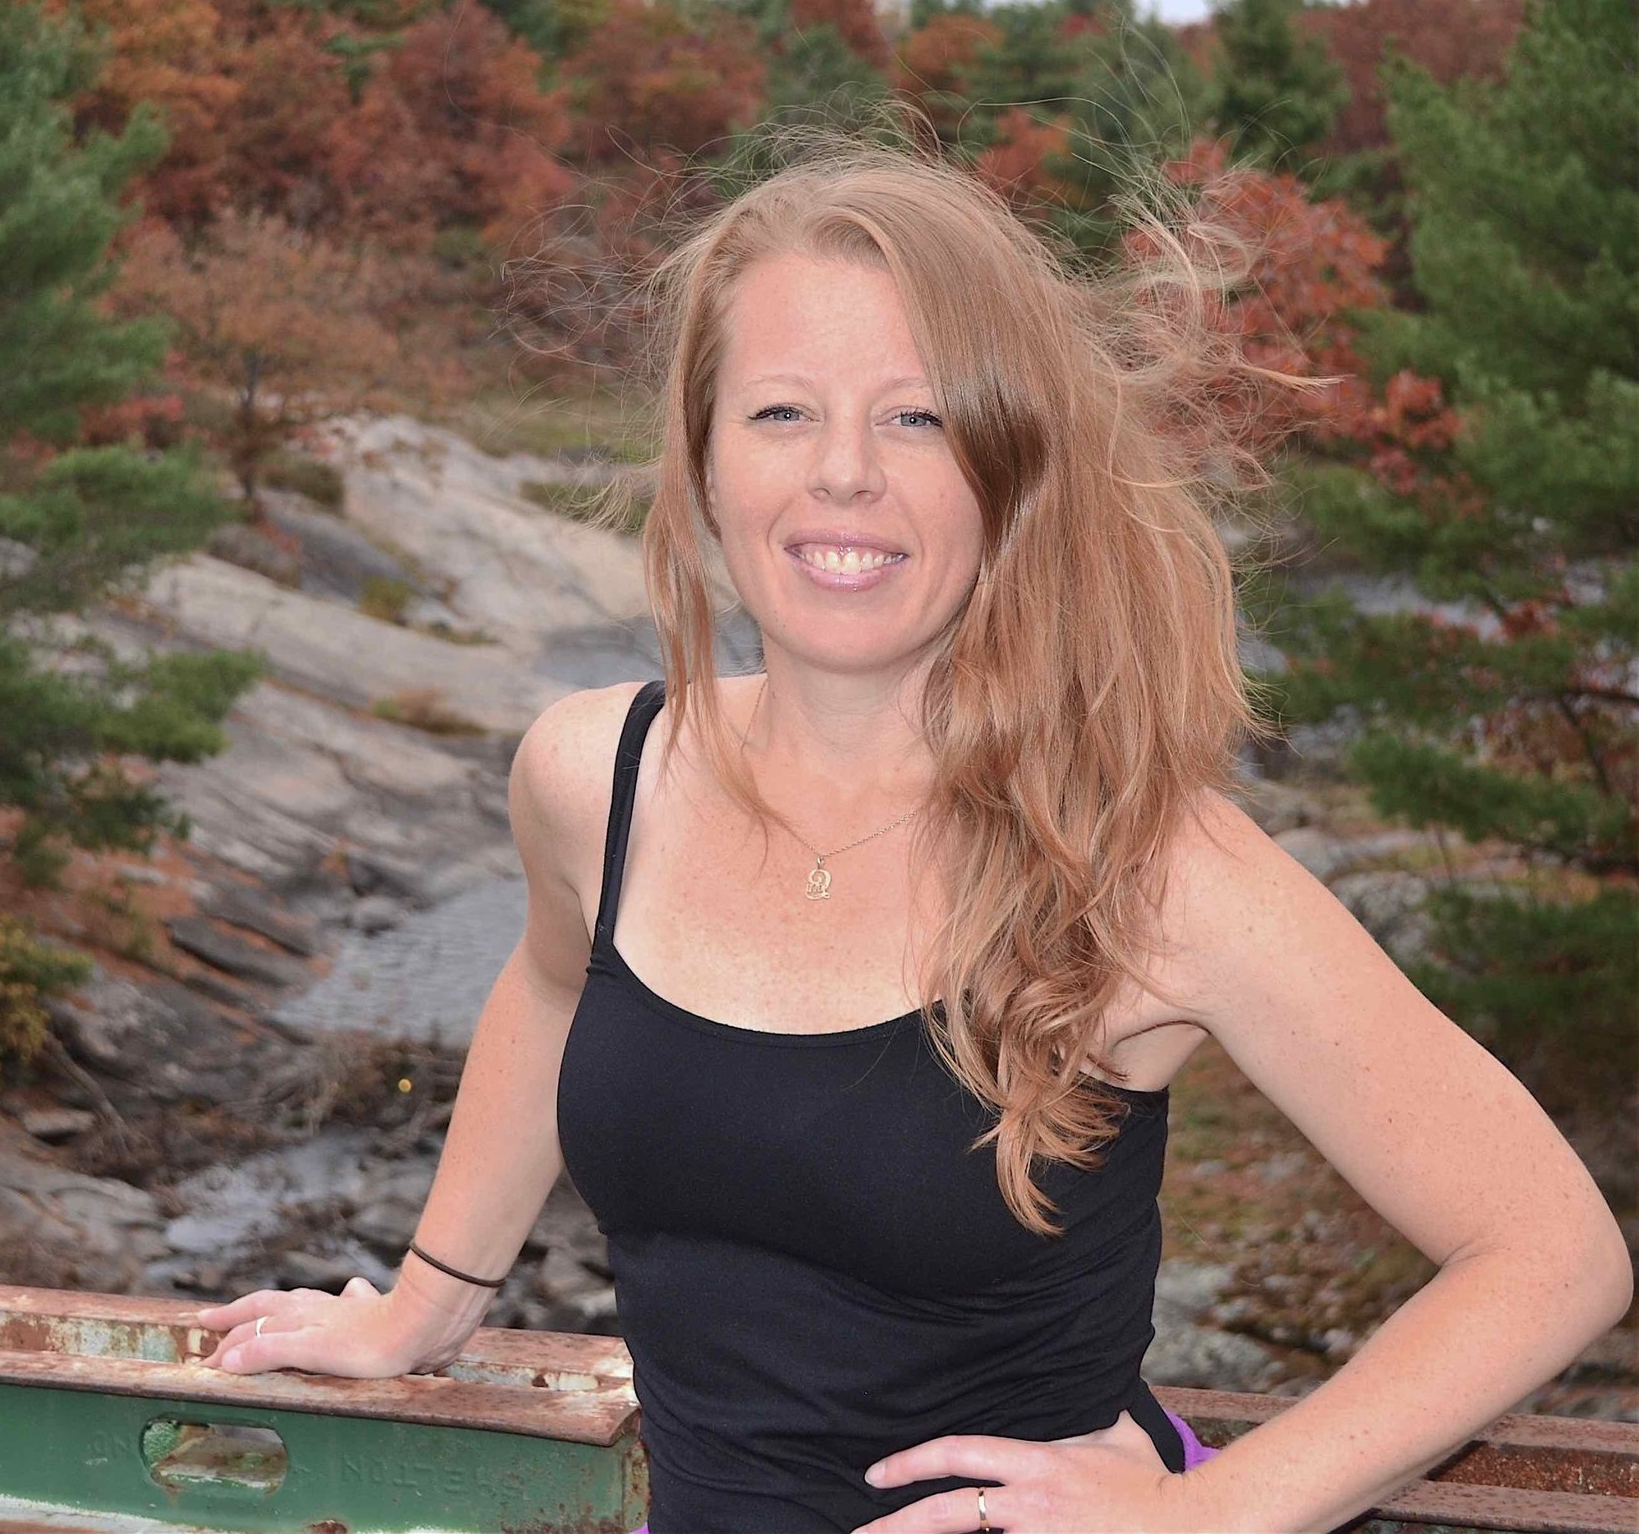 Caroline Watters, Life, Career & Business Coach, Intuitive Healer & Reiki Master